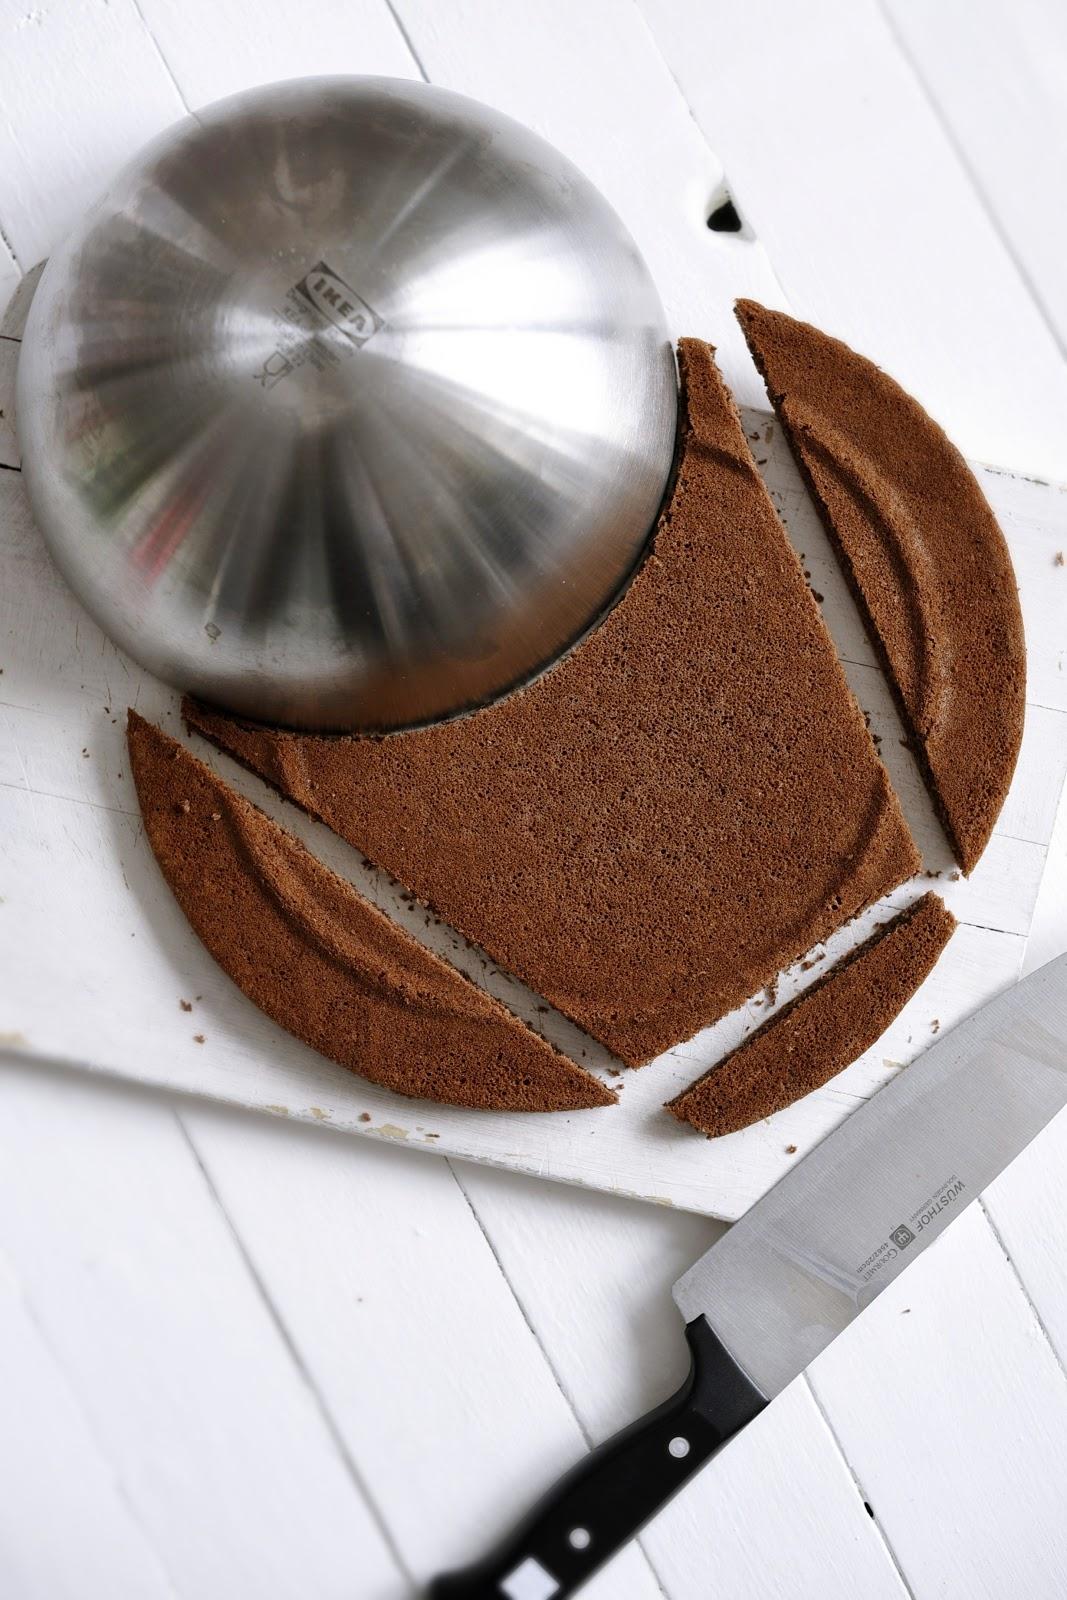 kessy 39 s pink sugar millennium falcon star wars cake 3 d torte. Black Bedroom Furniture Sets. Home Design Ideas